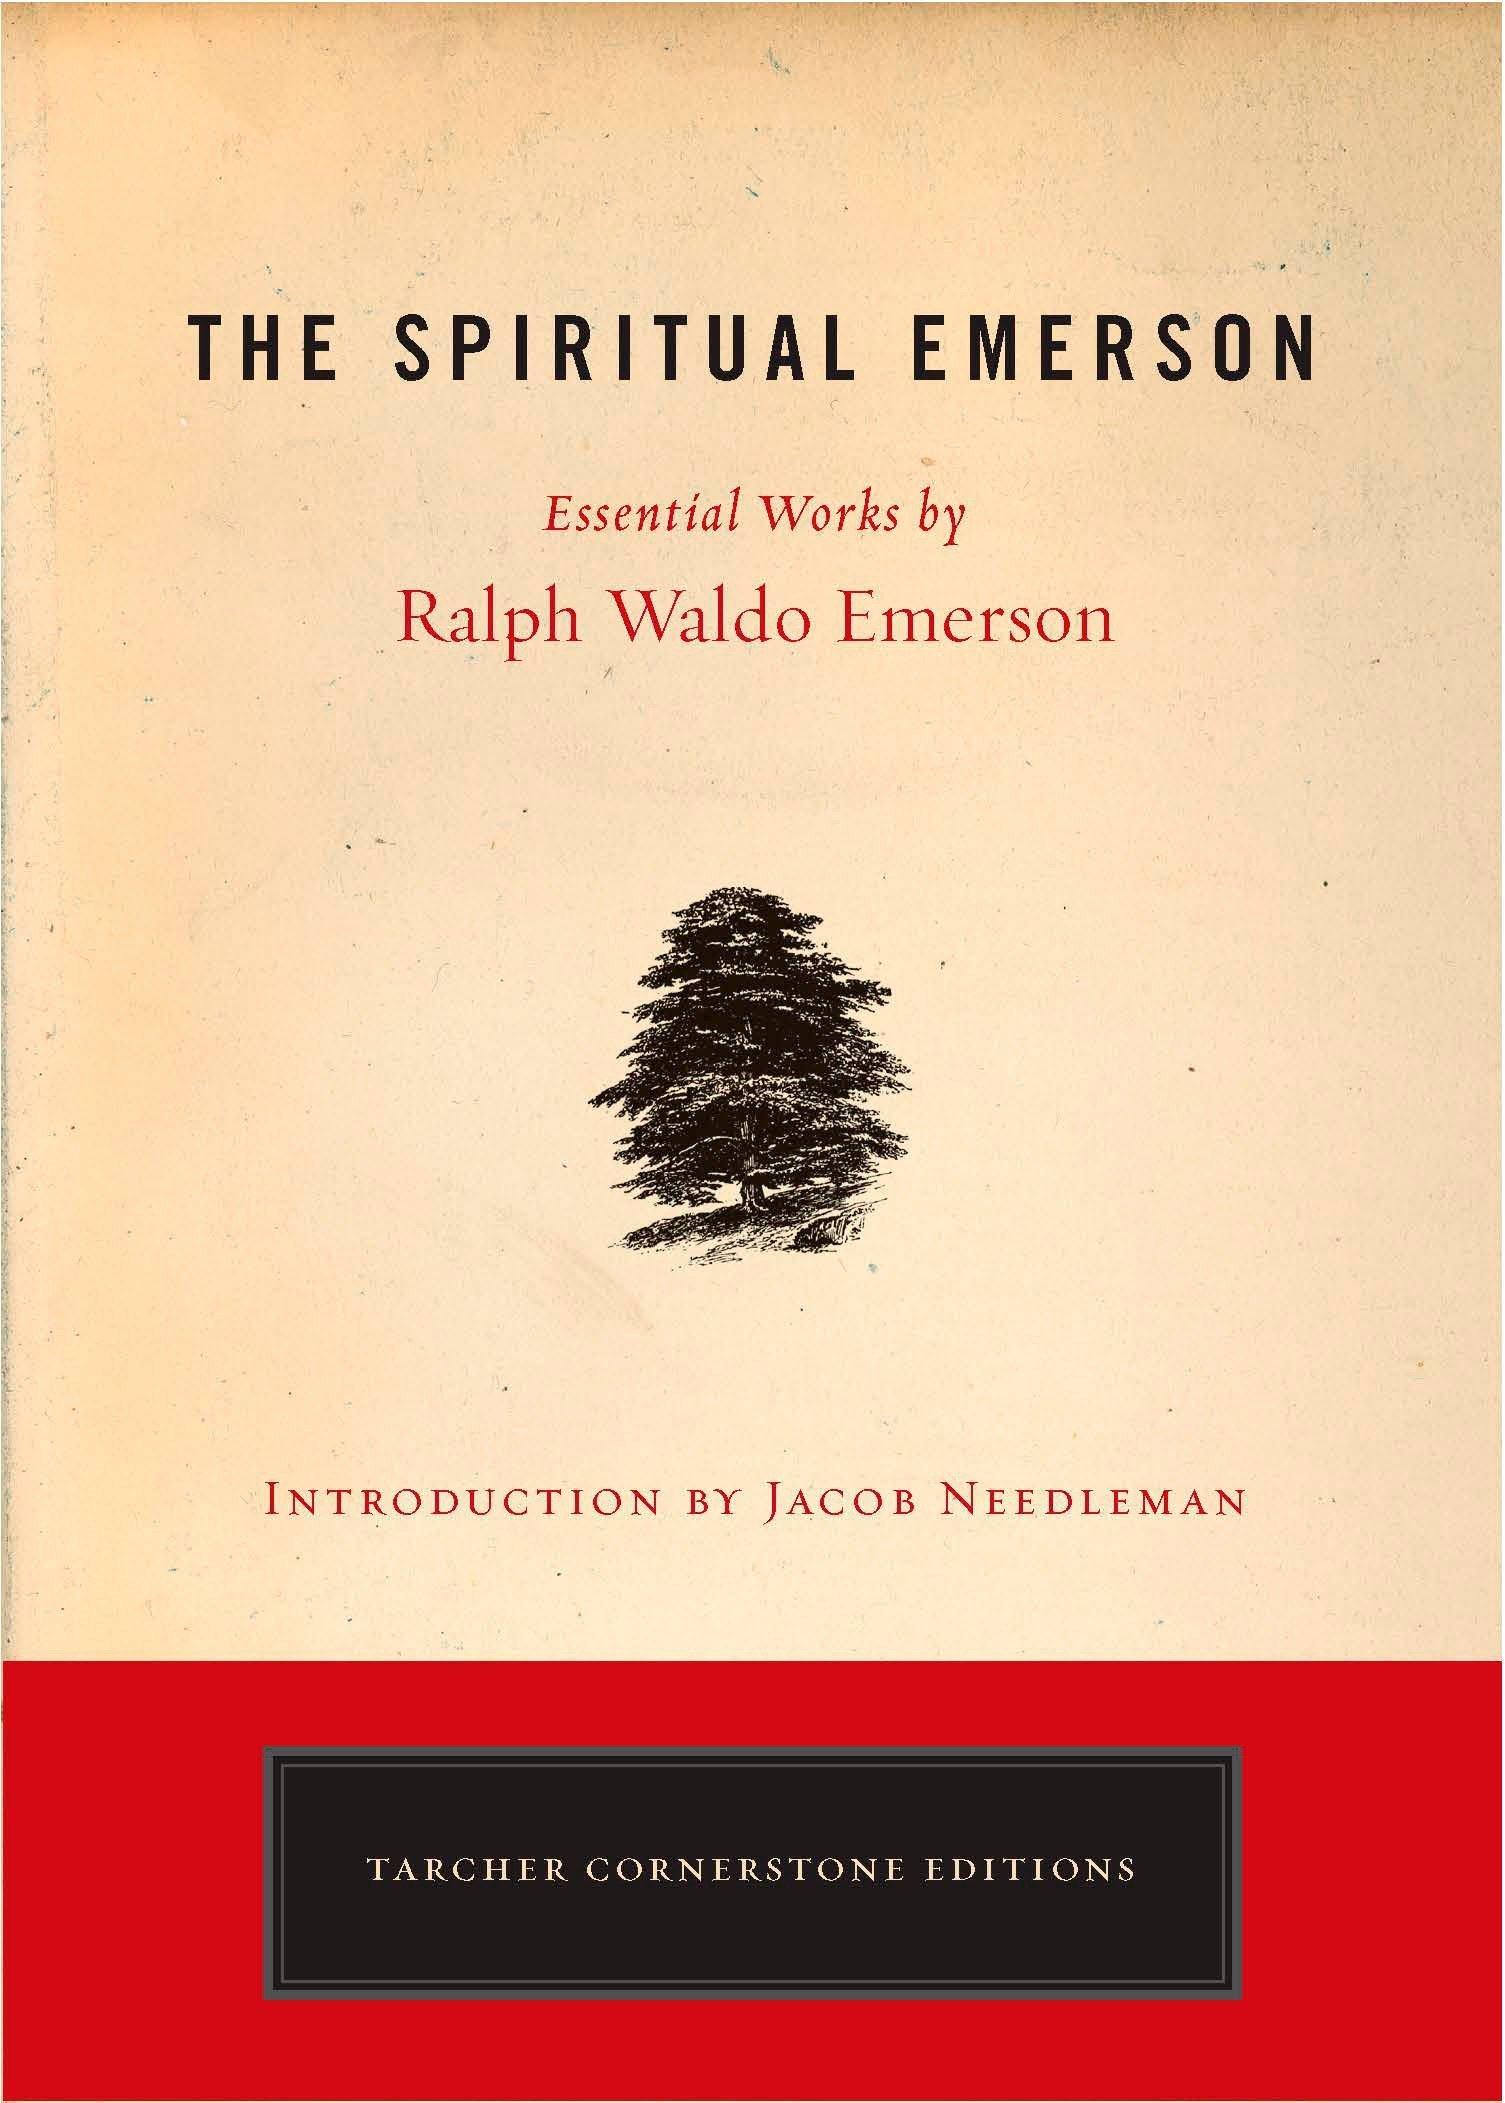 Download The Spiritual Emerson: Essential Works by Ralph Waldo Emerson (Tarcher Cornerstone Editions) ebook